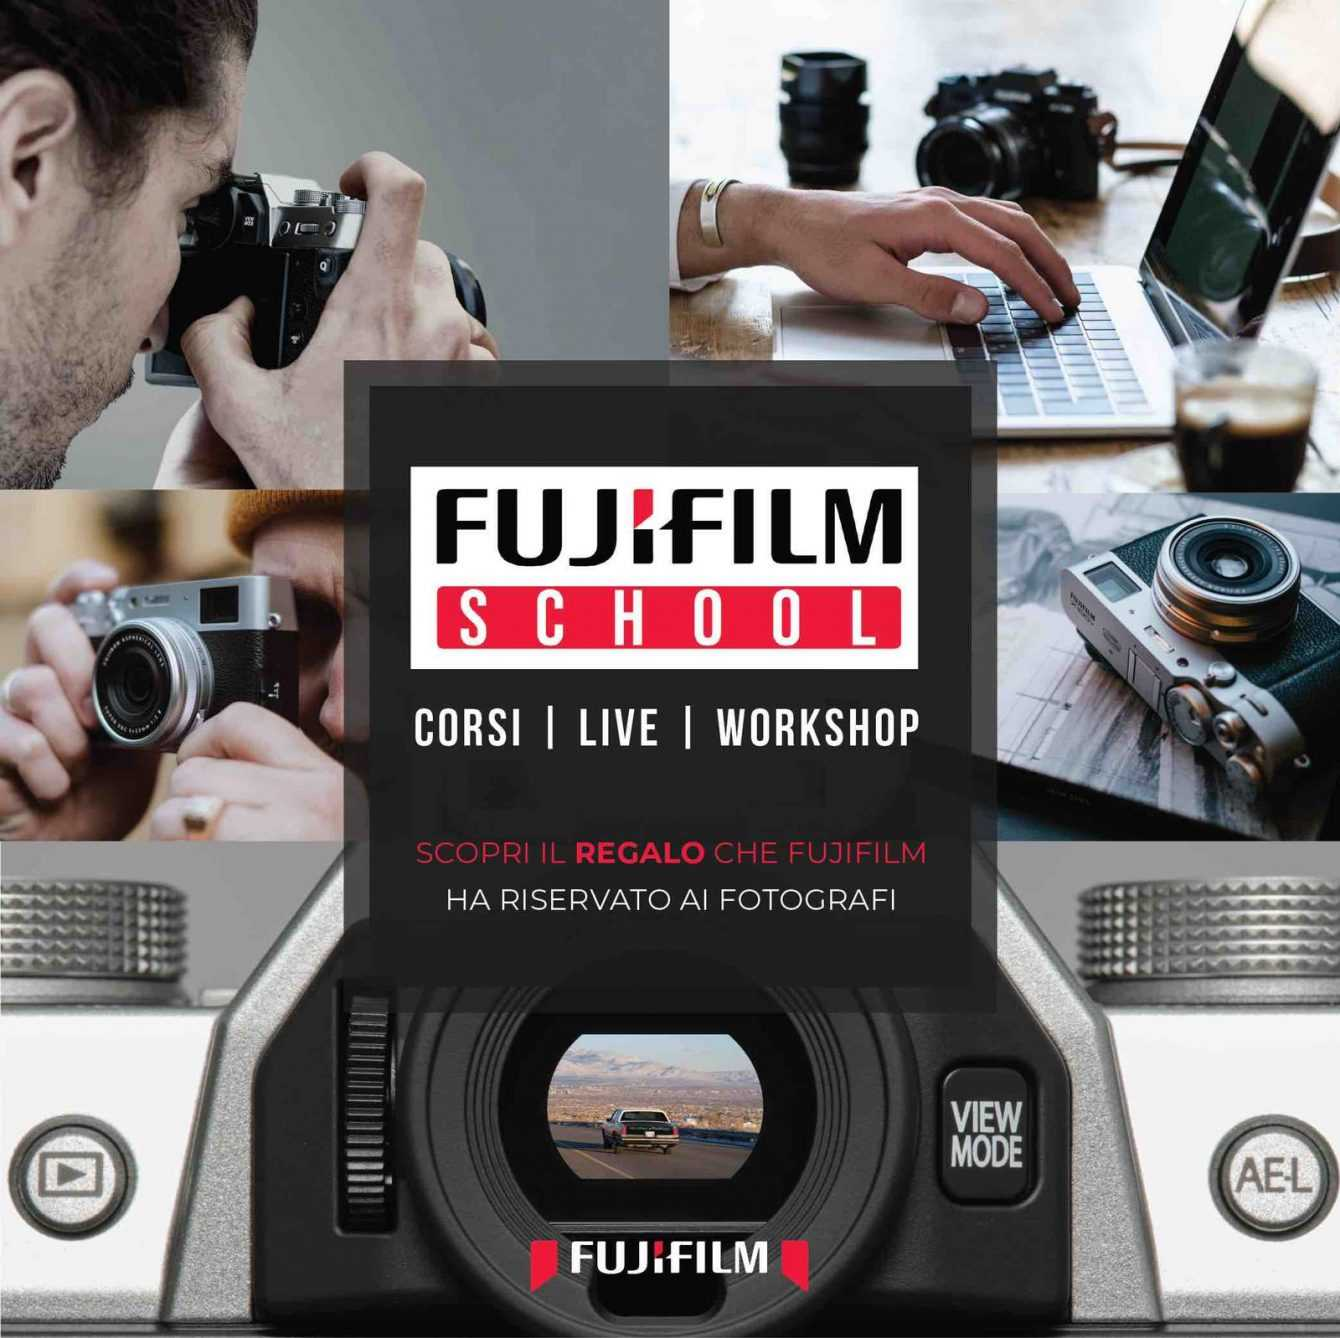 Fujifilm School: the new educational platform